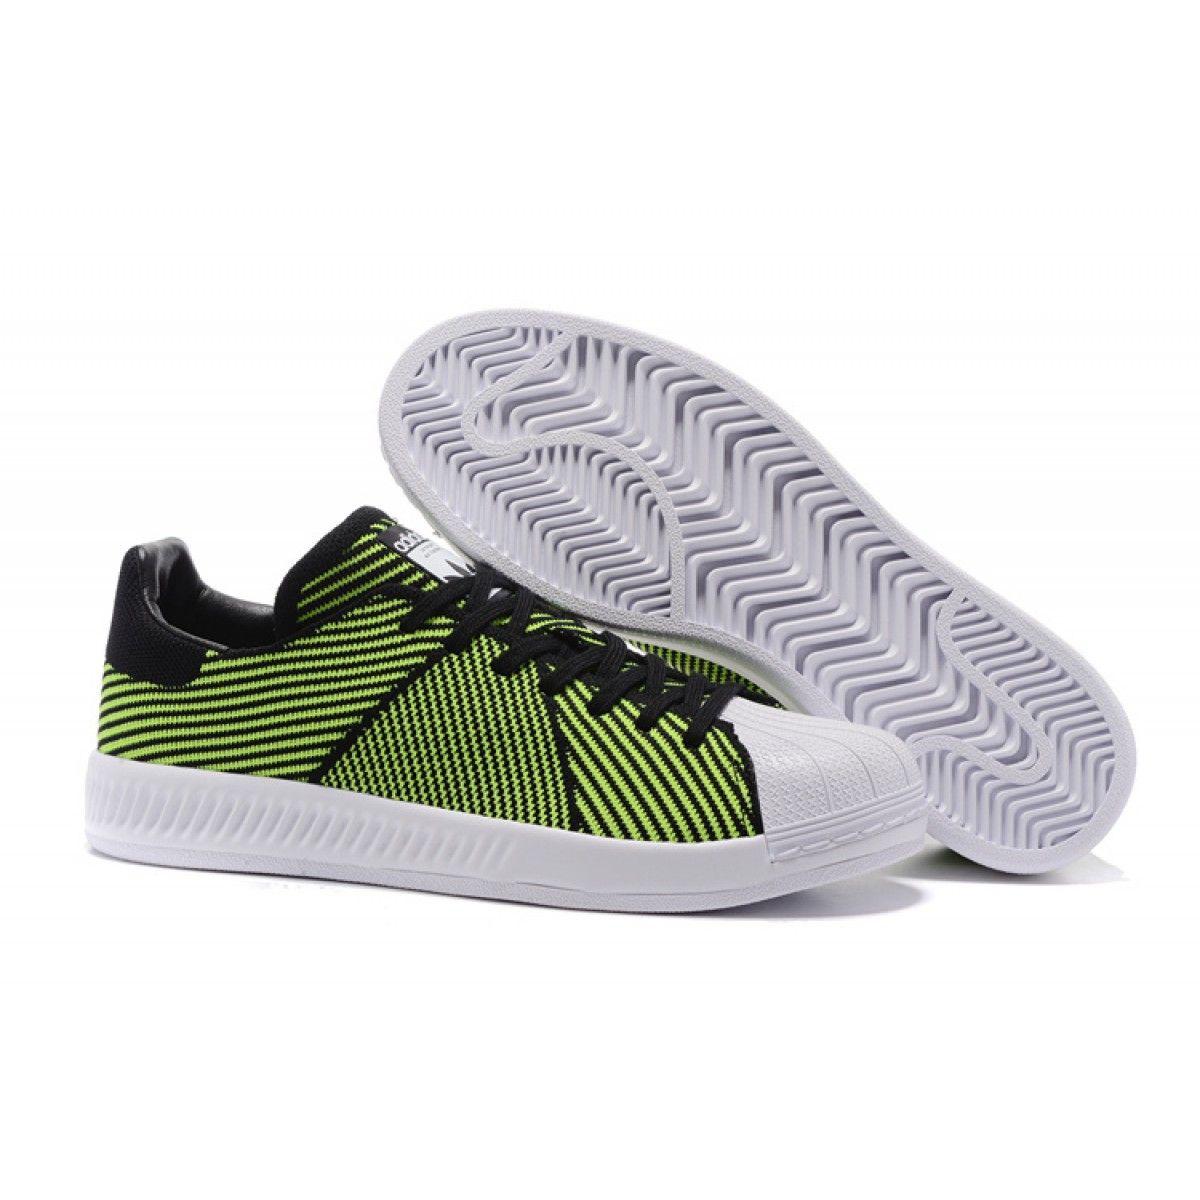 online store e12b5 c1d95 ... best adidas originals superstar bounce primeknit scarpe unisex verde  chiaro nero 5008a b7ee1